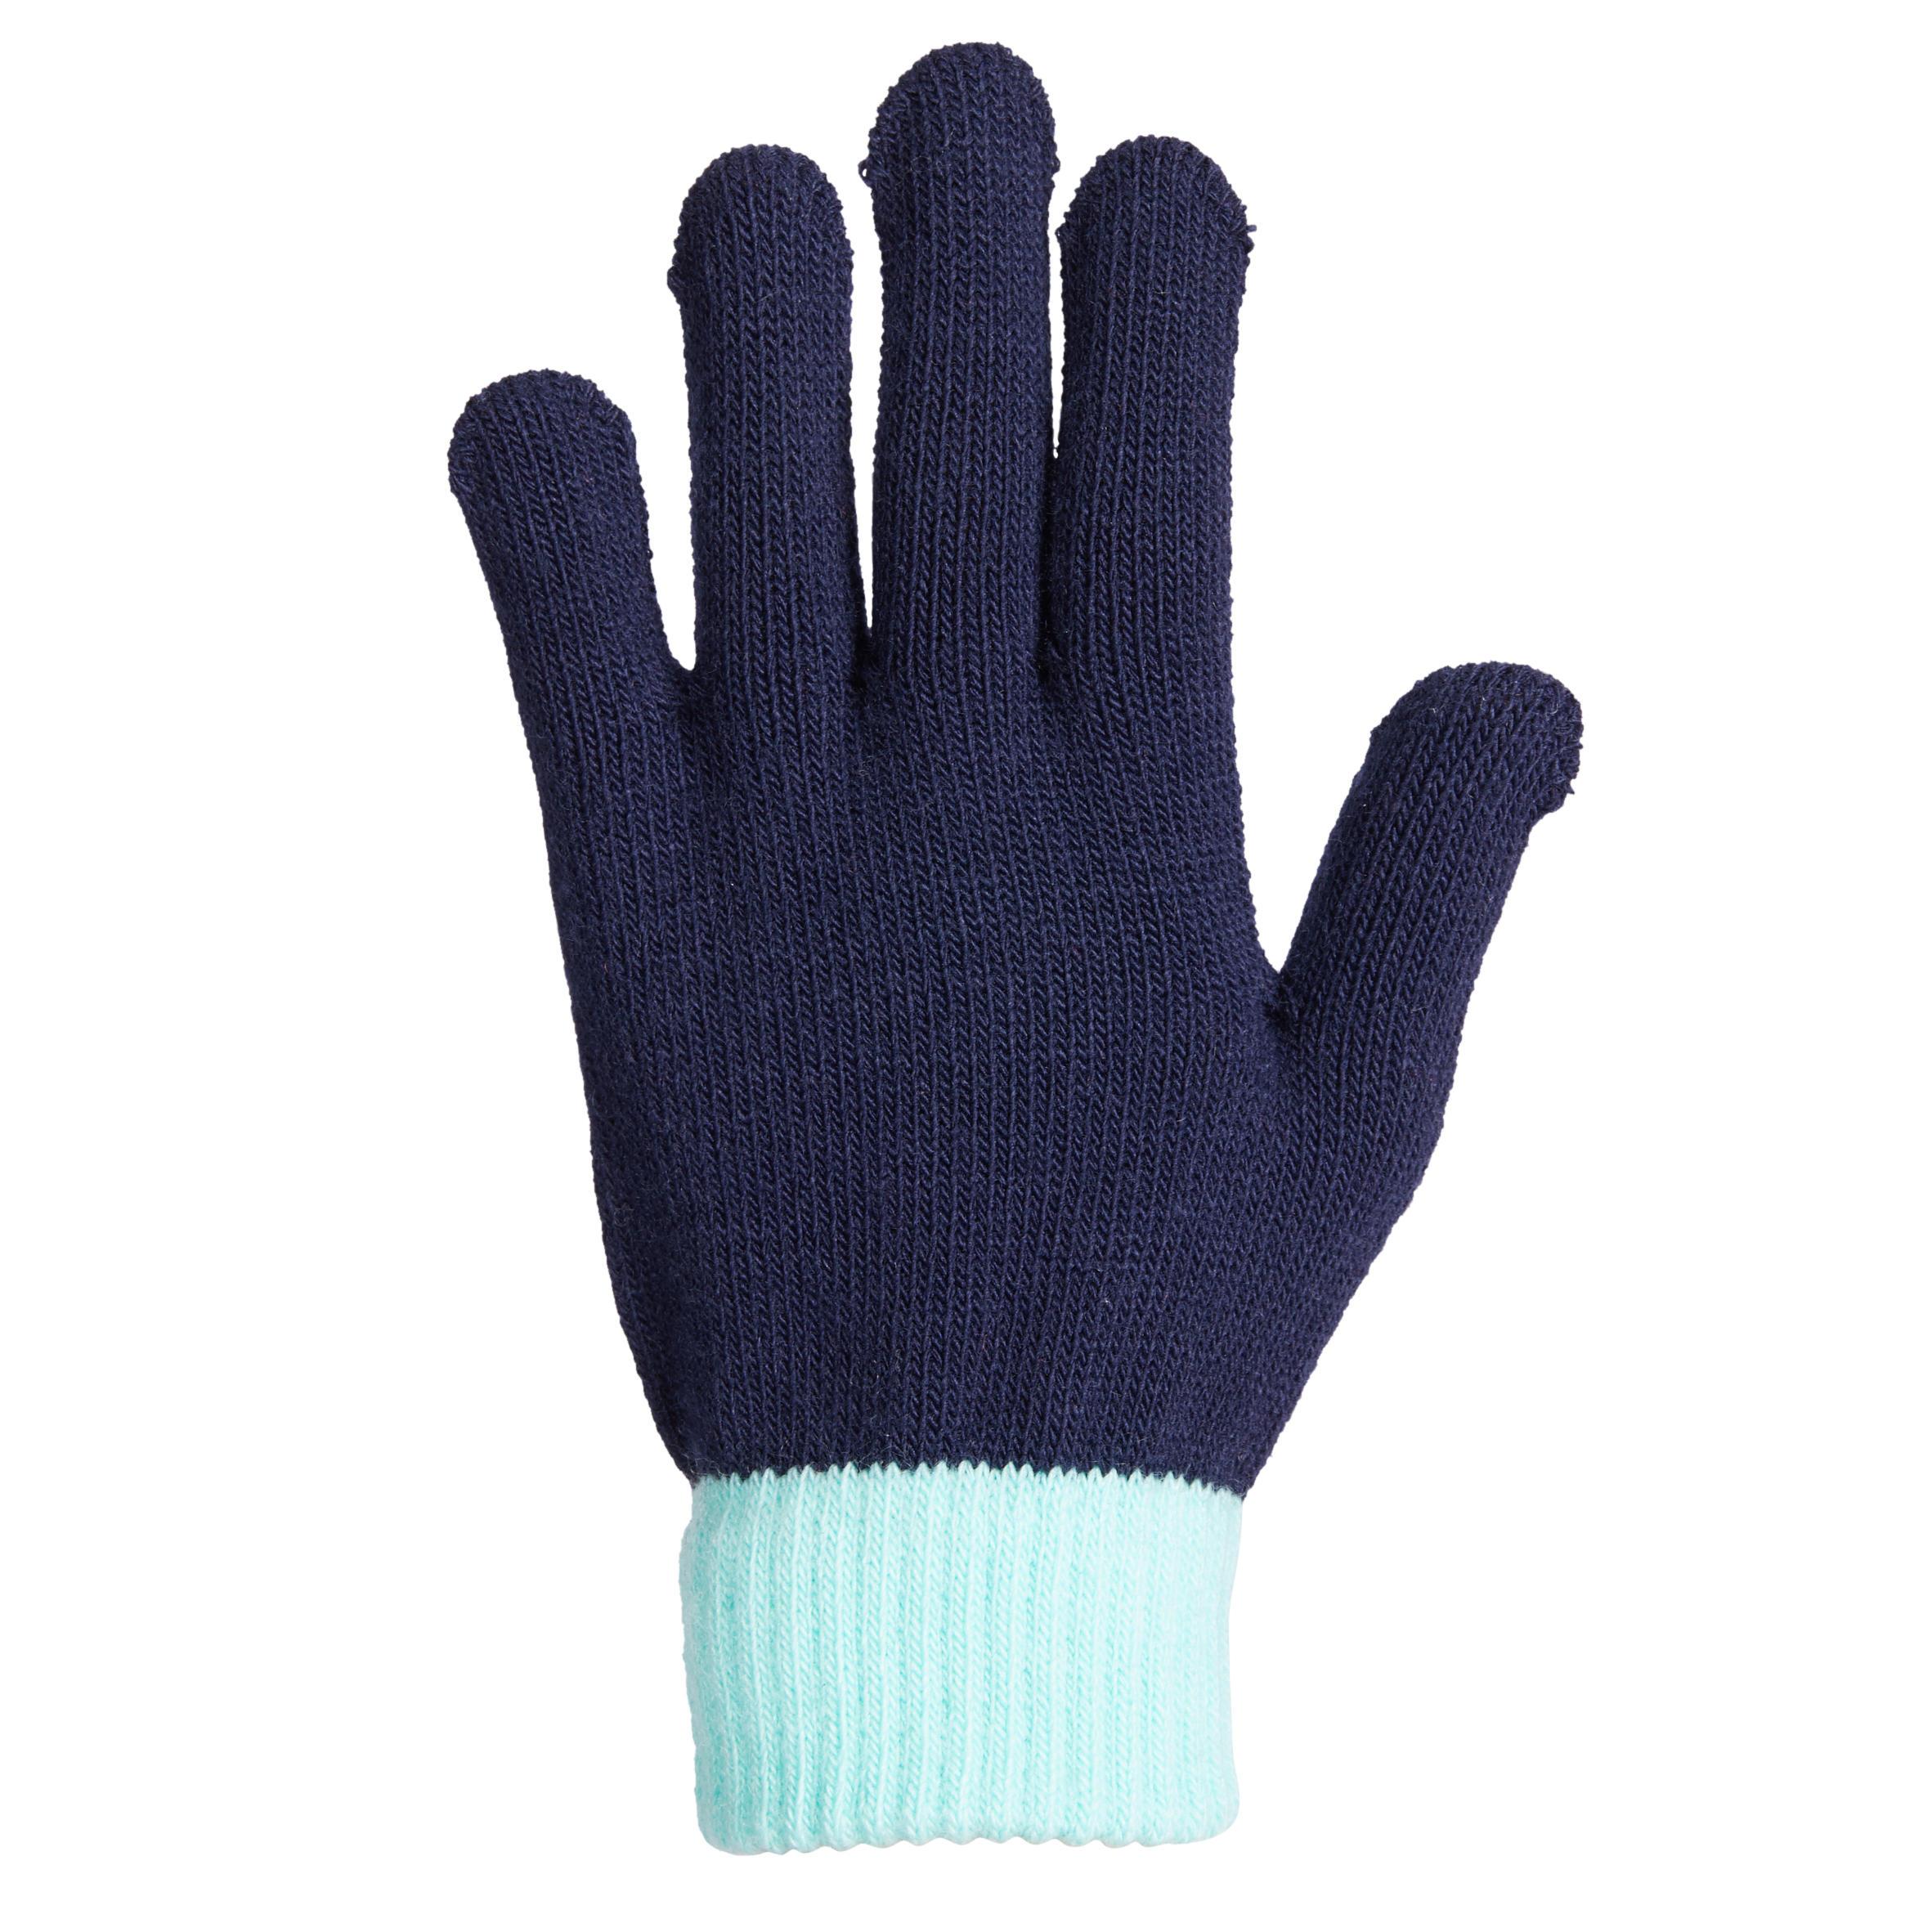 Mănuși Tricot Copii